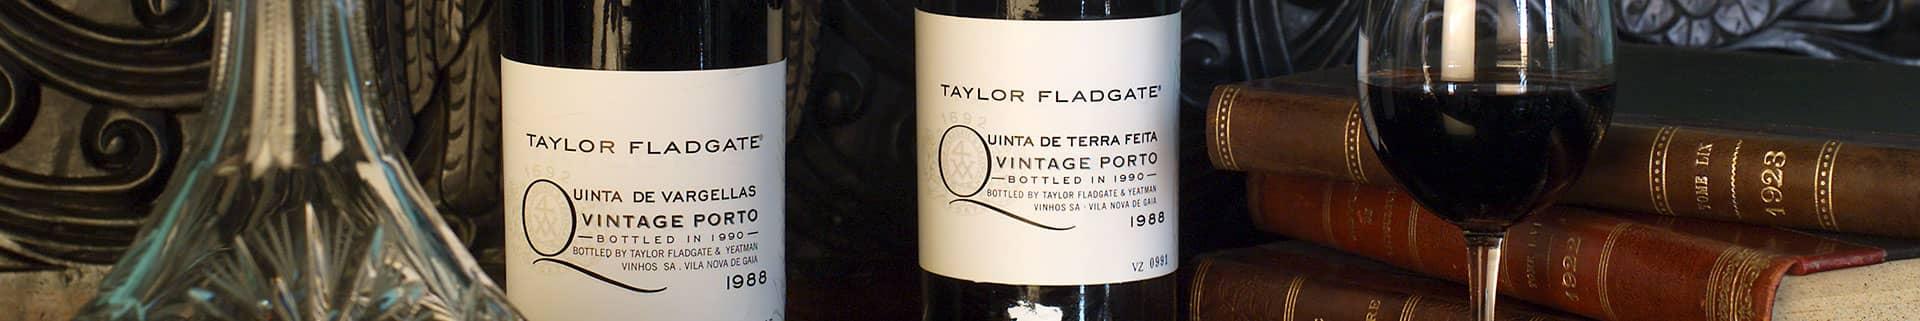 1988 Vintage Port: Vargellas and Terra Feita - Taylor Fladgate